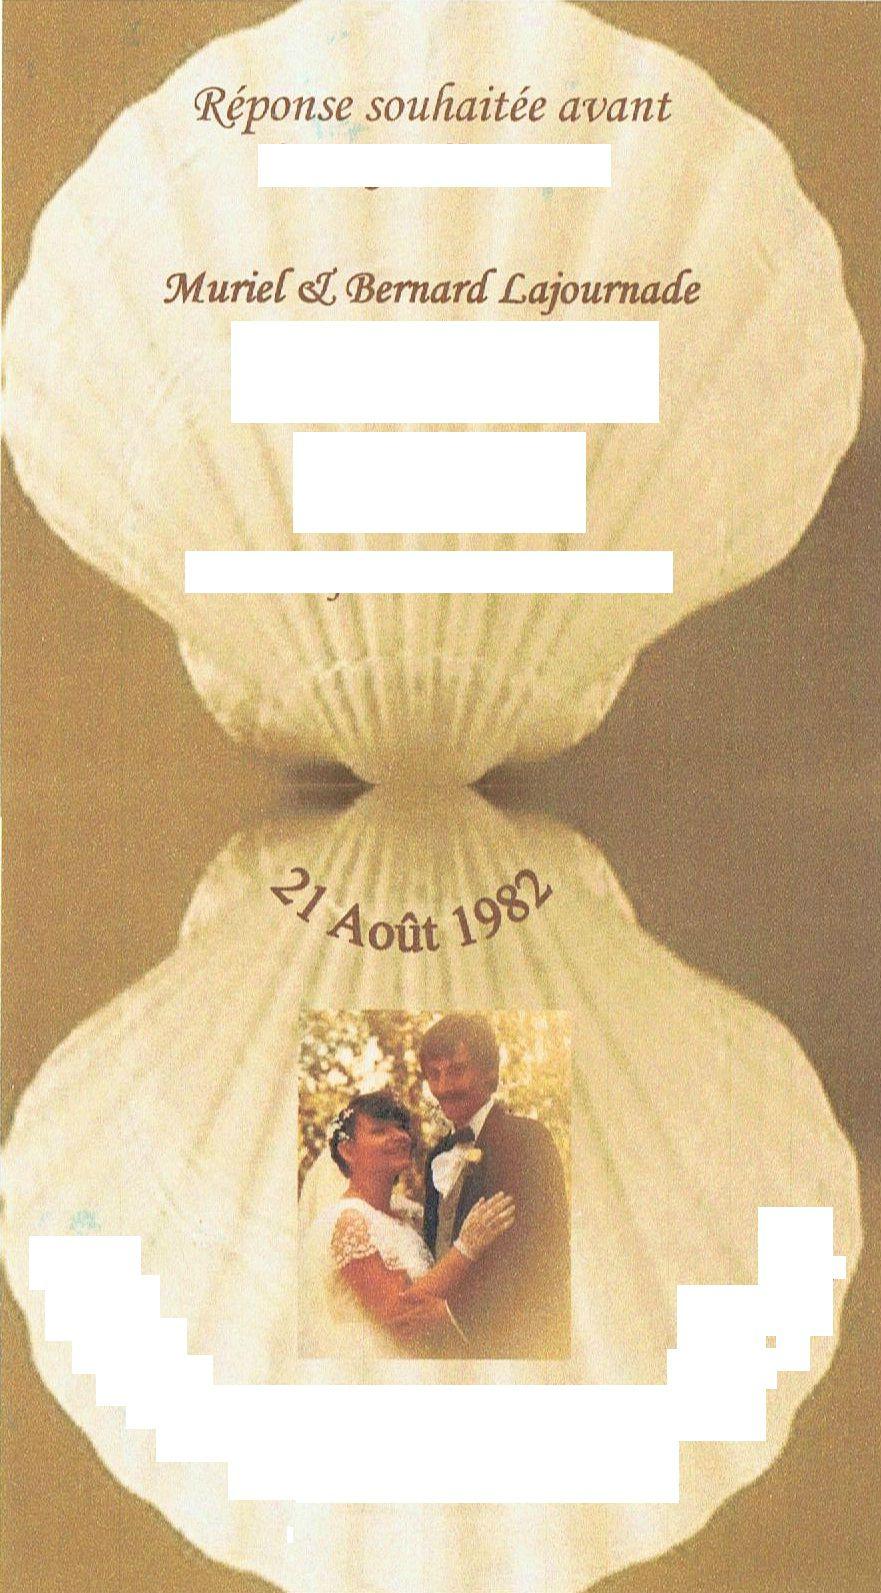 Diamond wedding bands cadeau de noces de perle - 30 ans de mariage noce de quoi ...